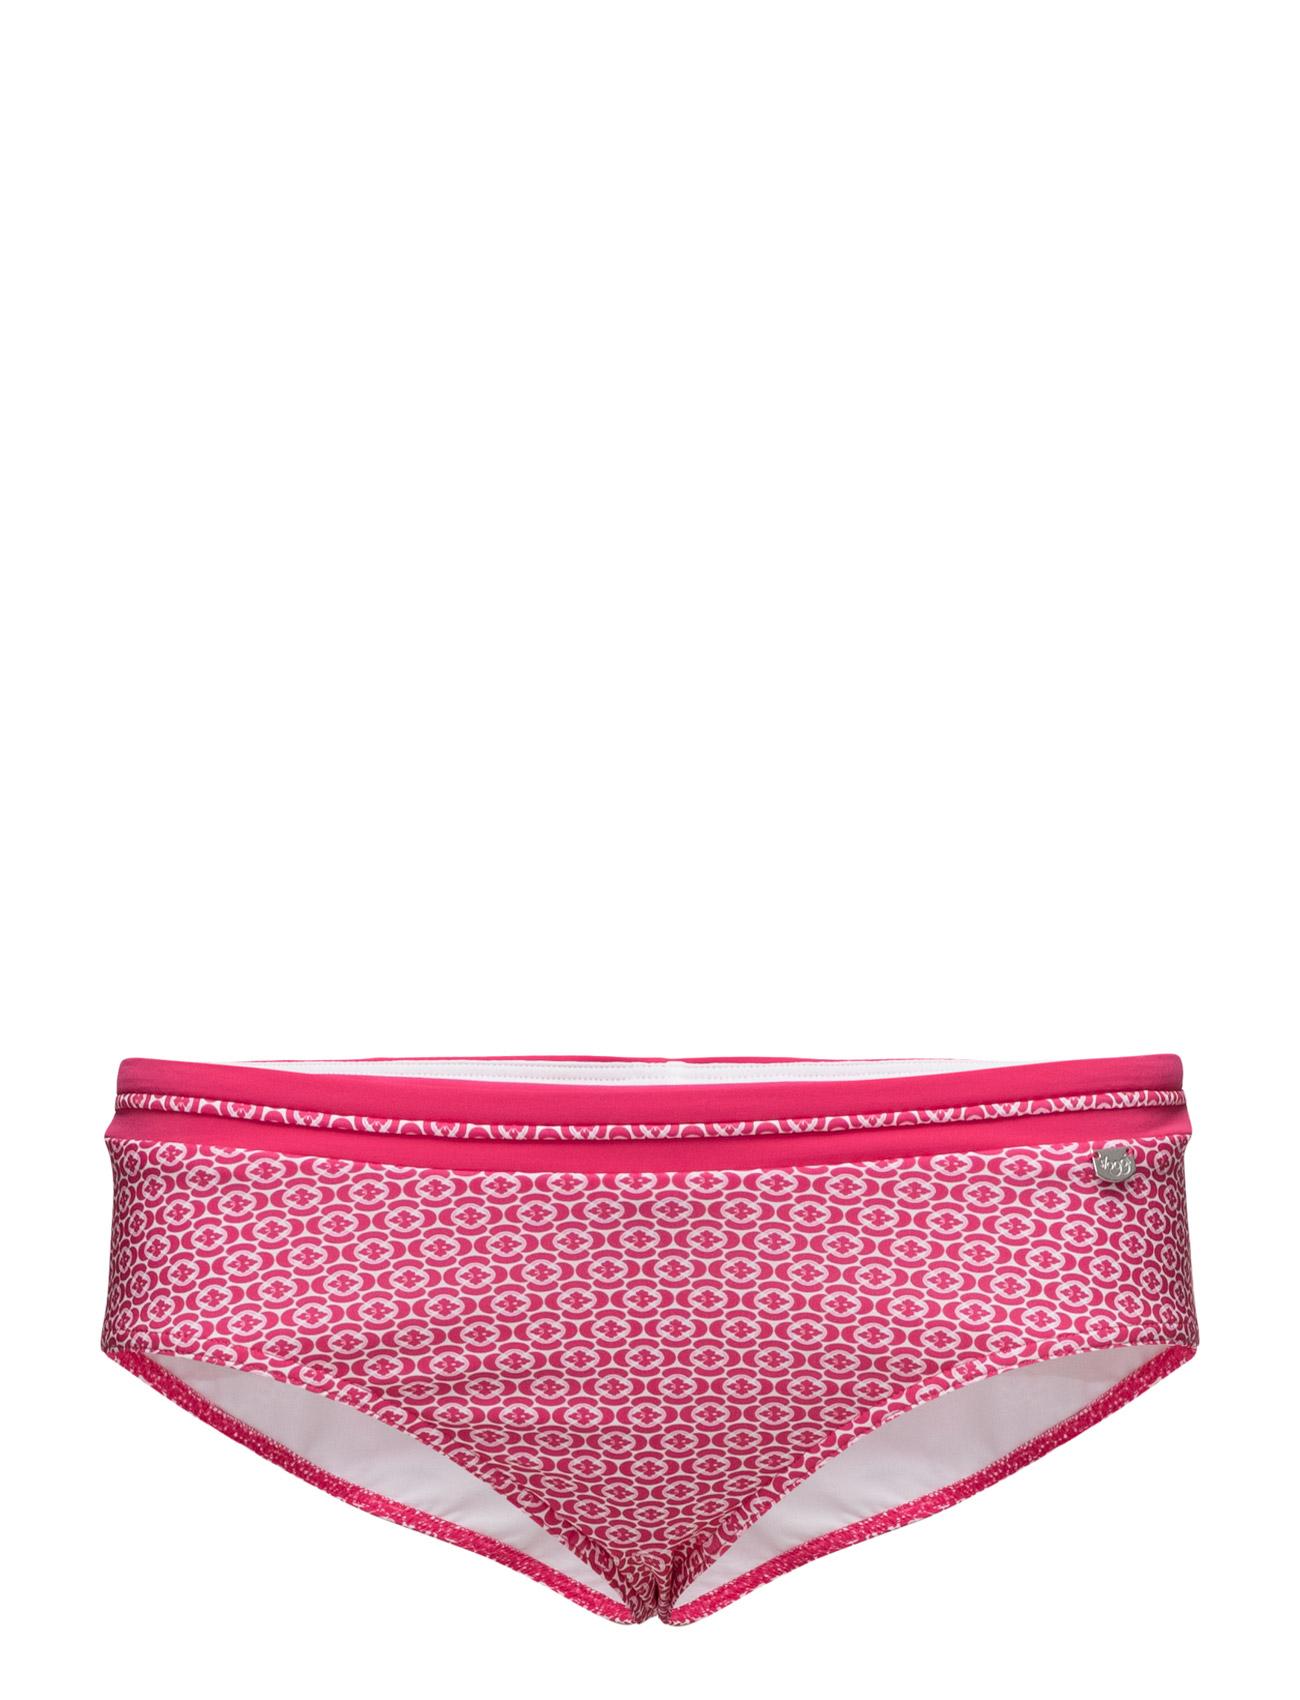 Sloggi Swim Raspberry Sweets Hipste sloggi Bikinier til Damer i